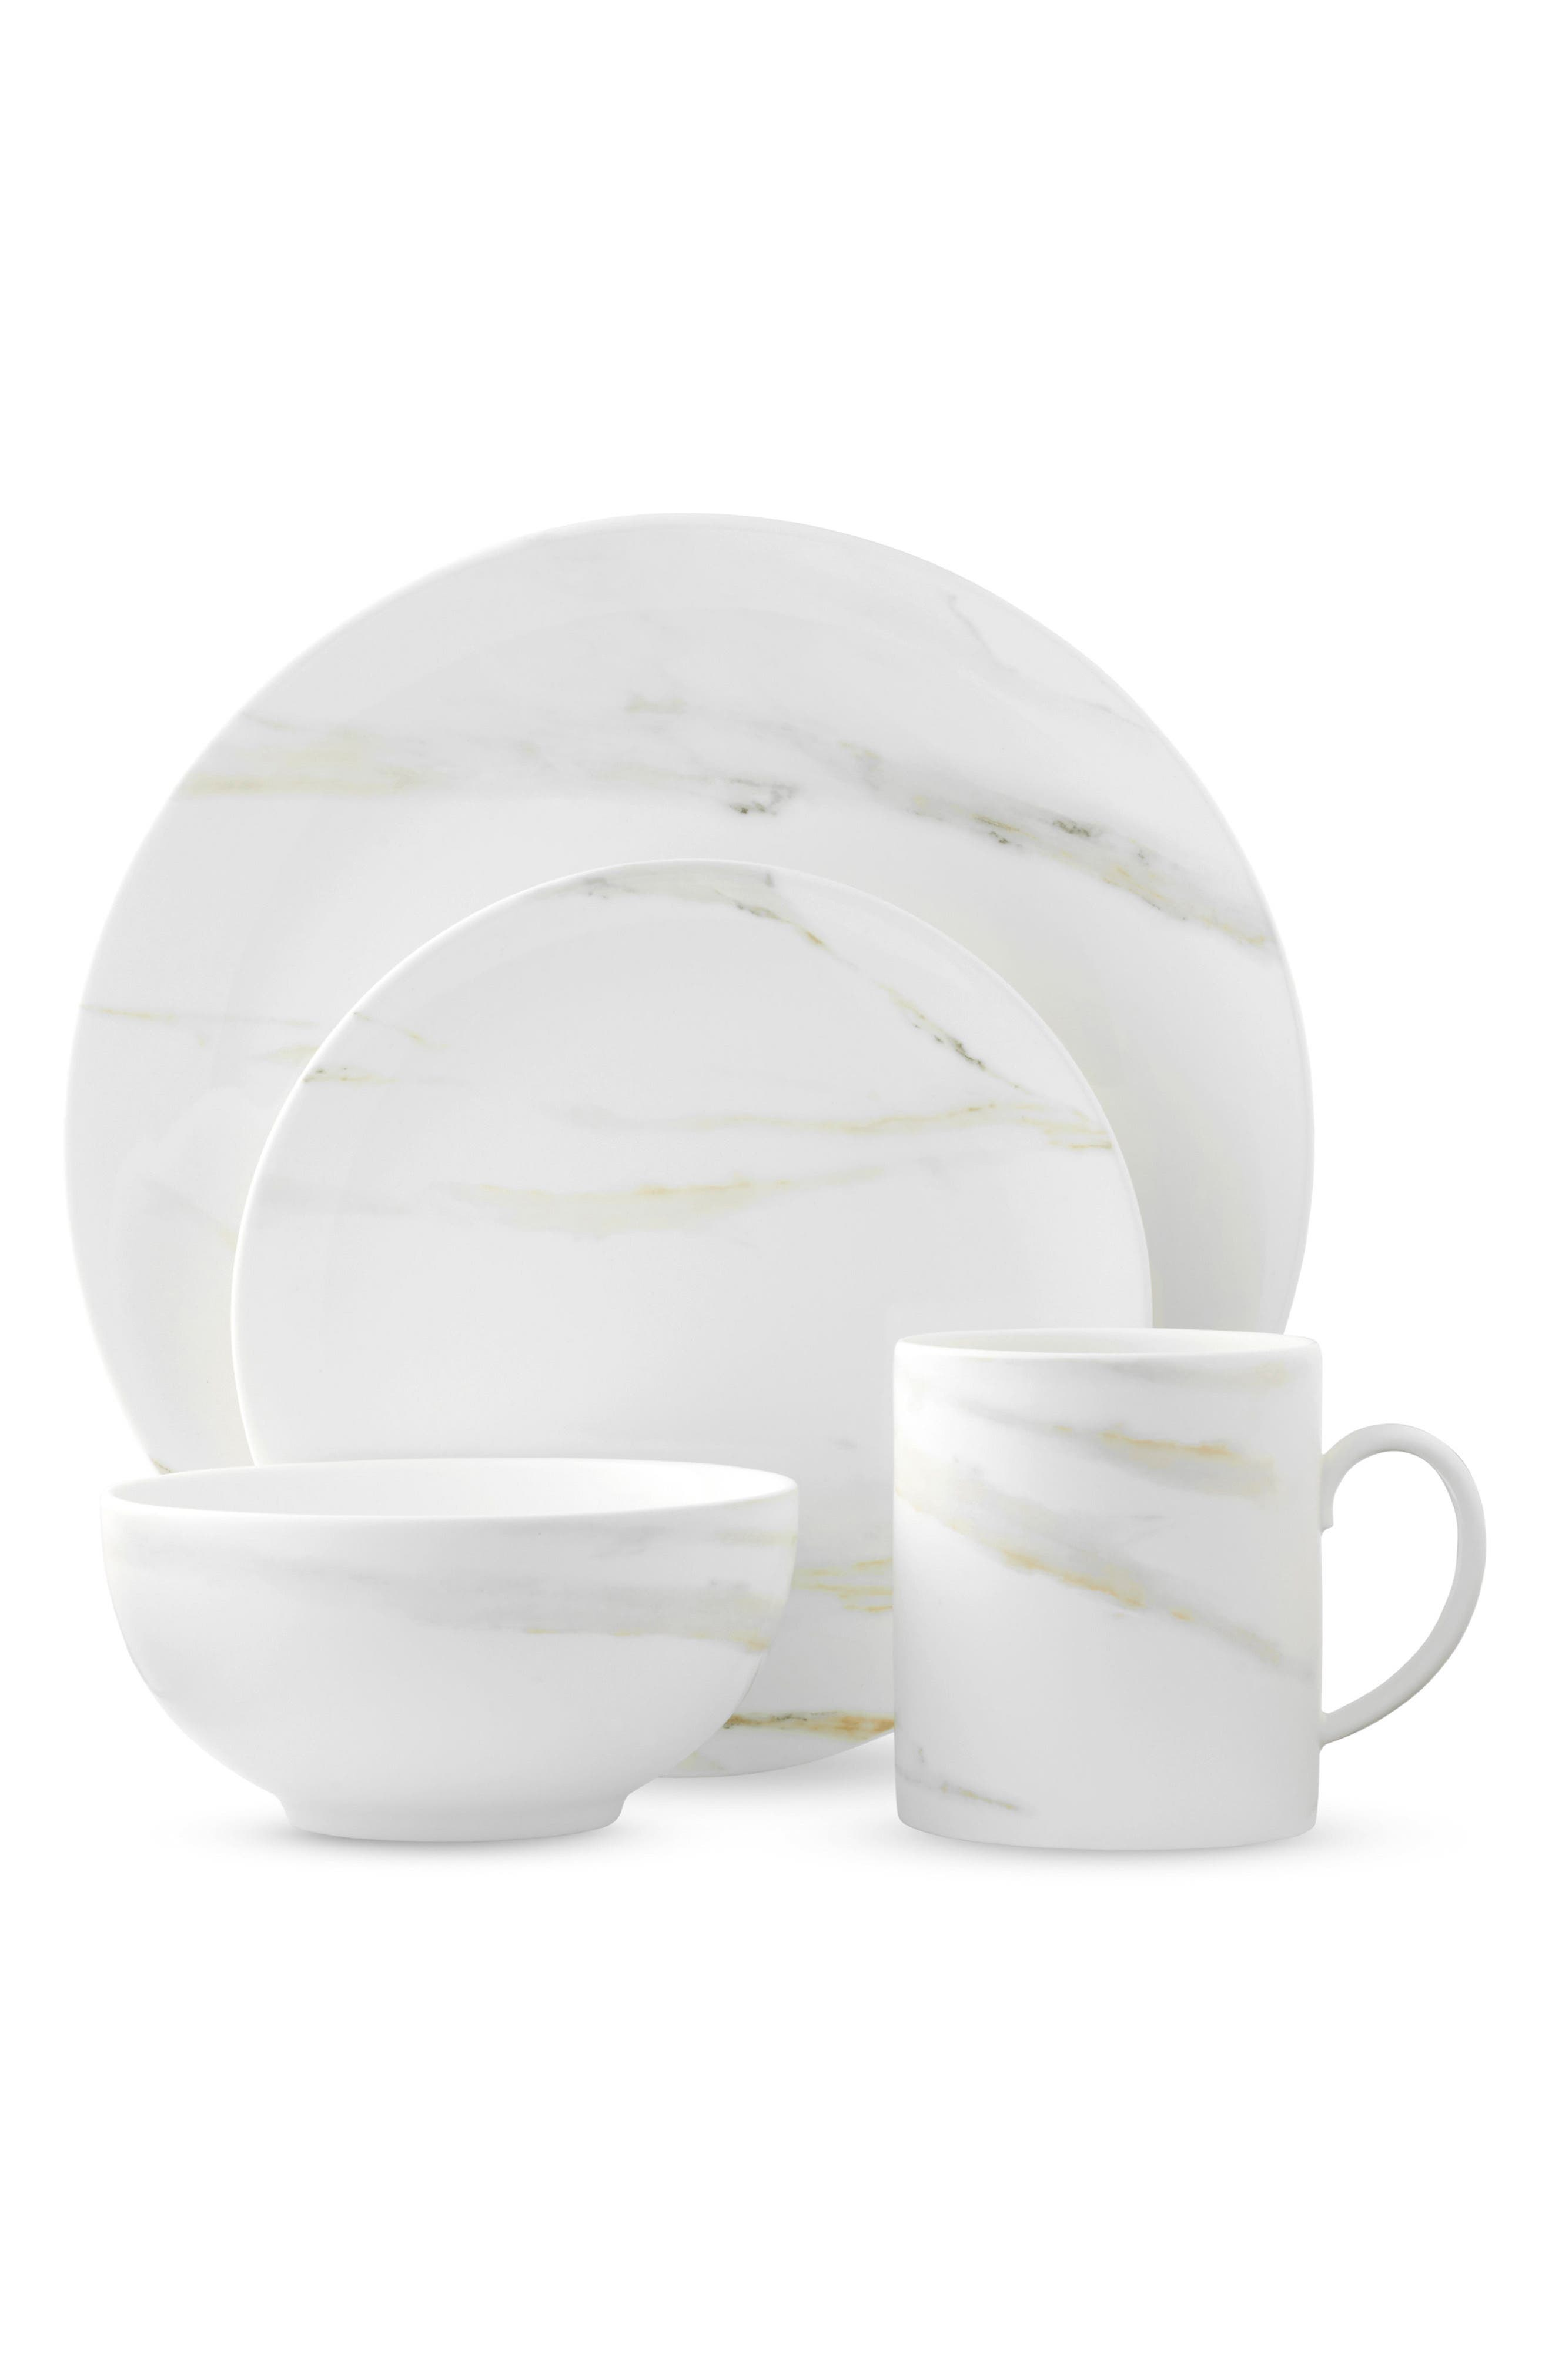 Main Image - Vera Wang x Wedgwood Venato Imperial 4-Piece Bone China Dinnerware Place Setting